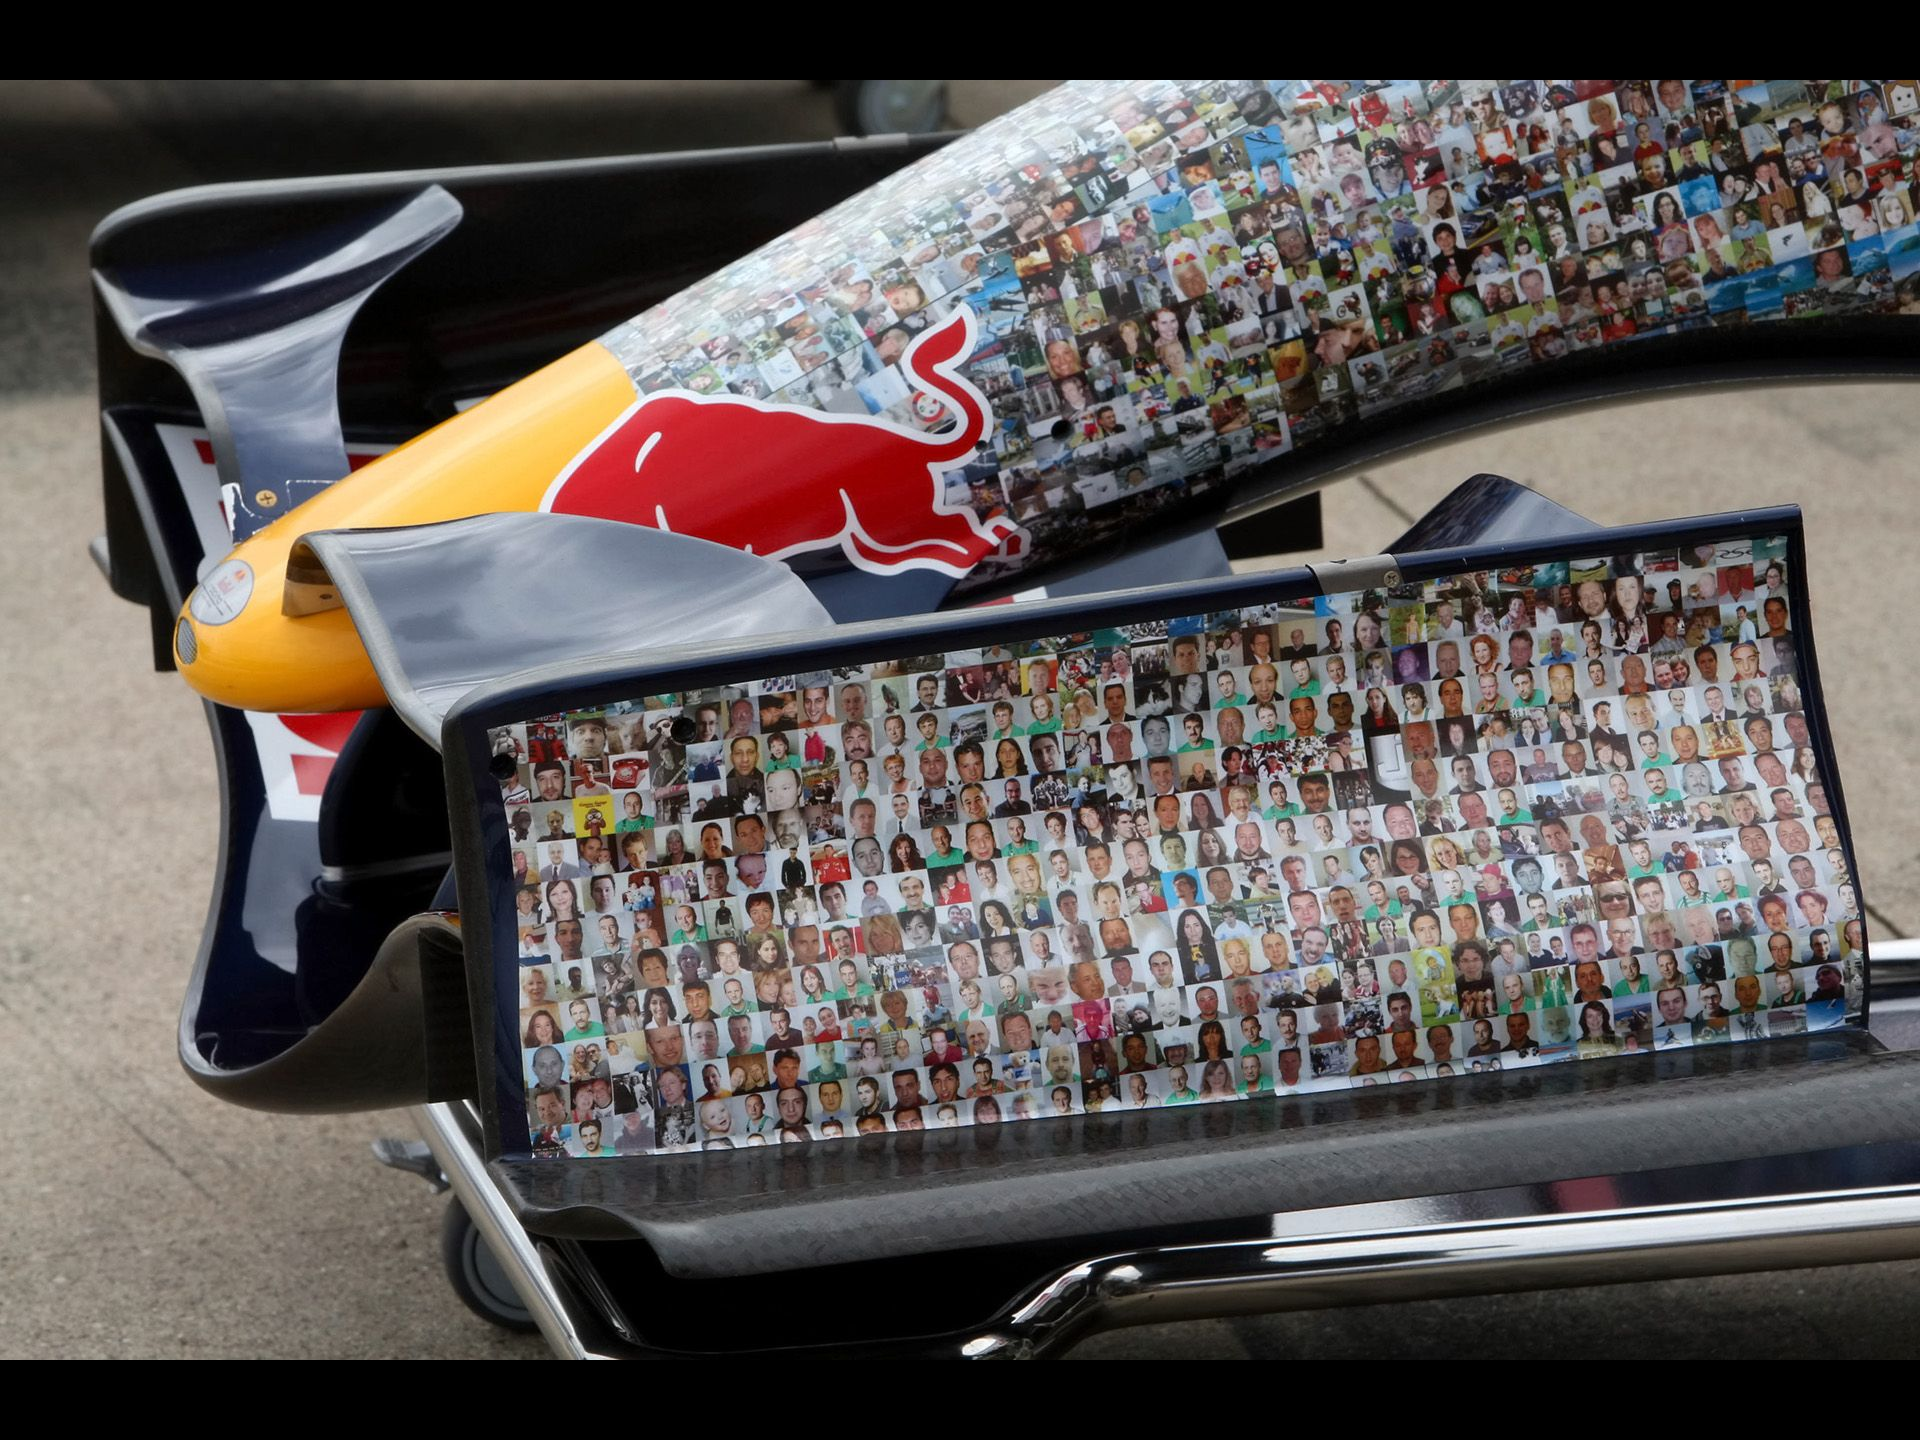 Google 이미지 검색결과: http://www.seriouswheels.com/pics-2007/2007-Red-Bull-RB3-F1-Faces-for-Charity-Wings-for-Life-1-1920x1440.jpg - via http://bit.ly/epinner